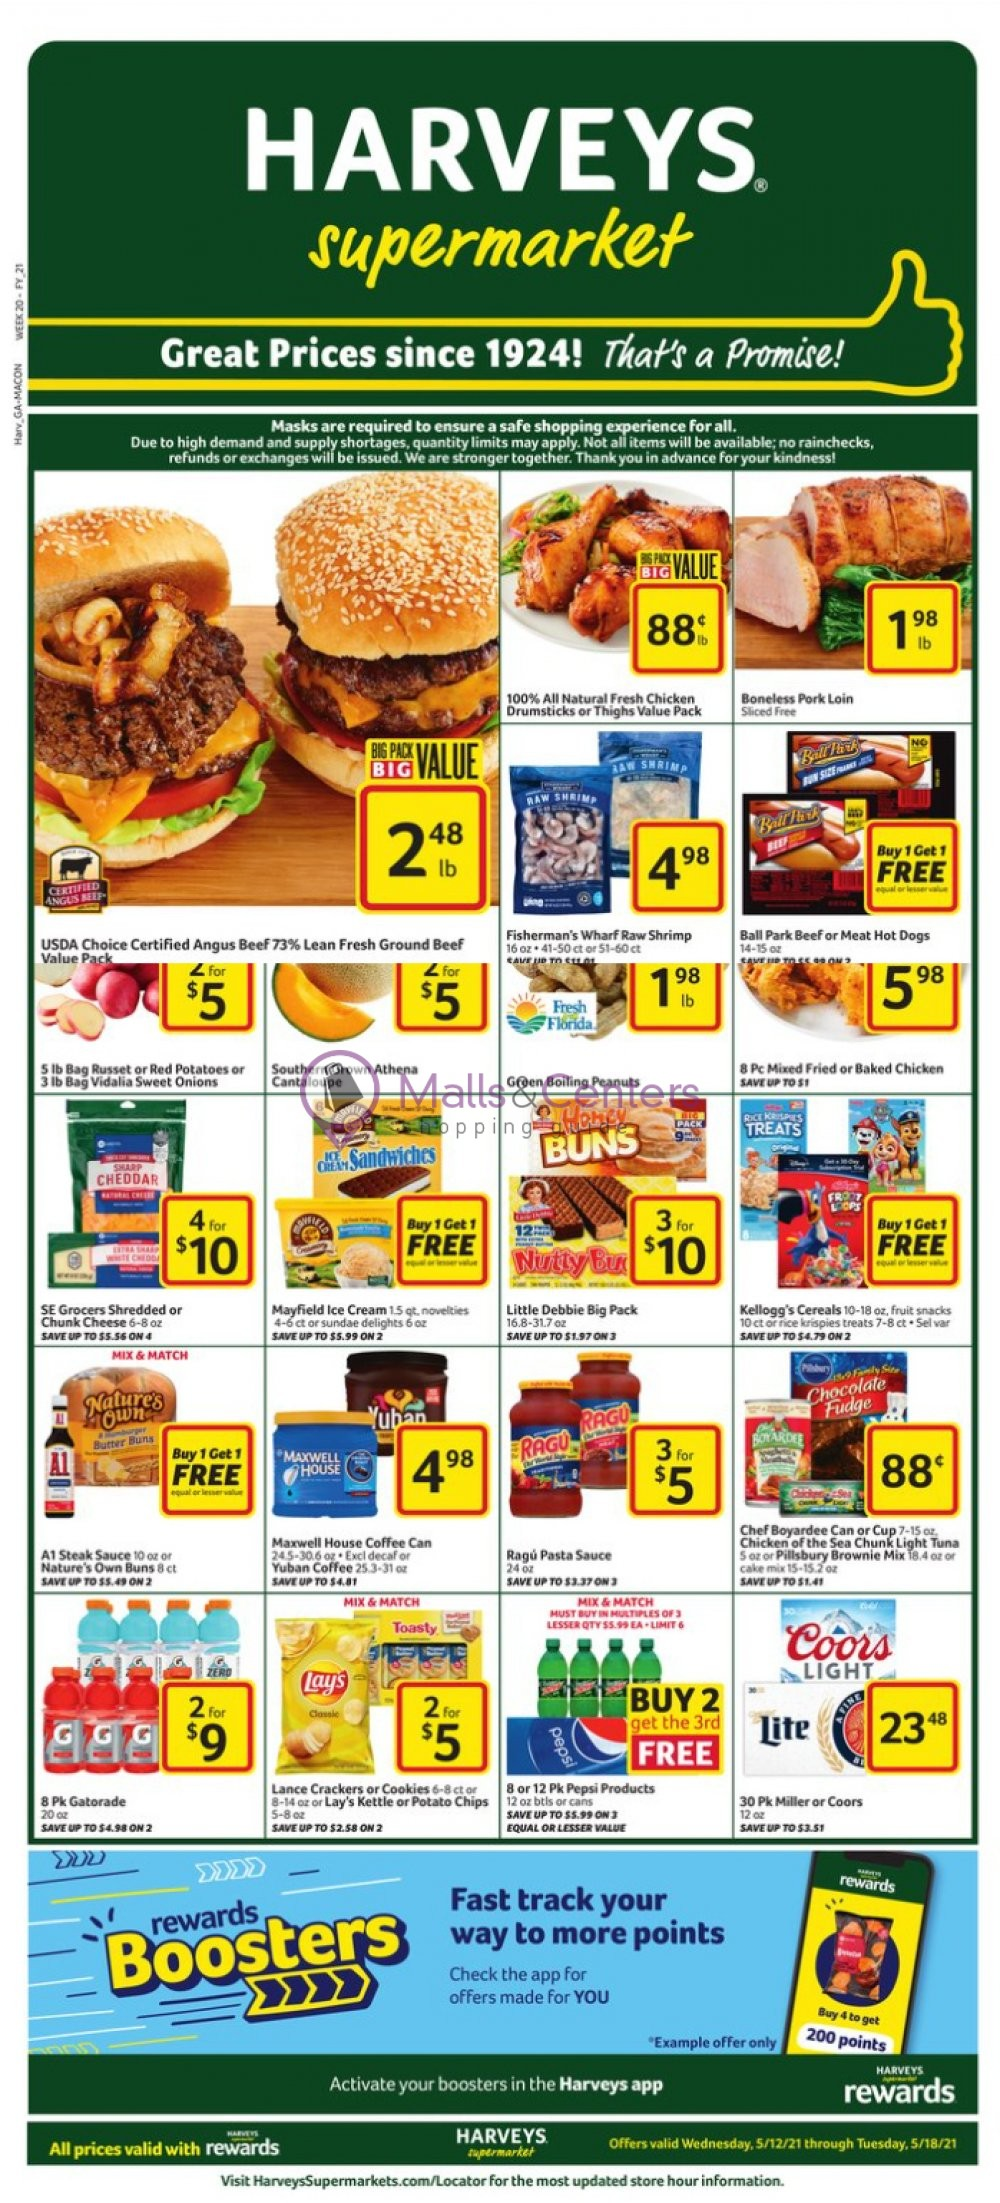 weekly ads Harveys Supermarket - page 1 - mallscenters.com